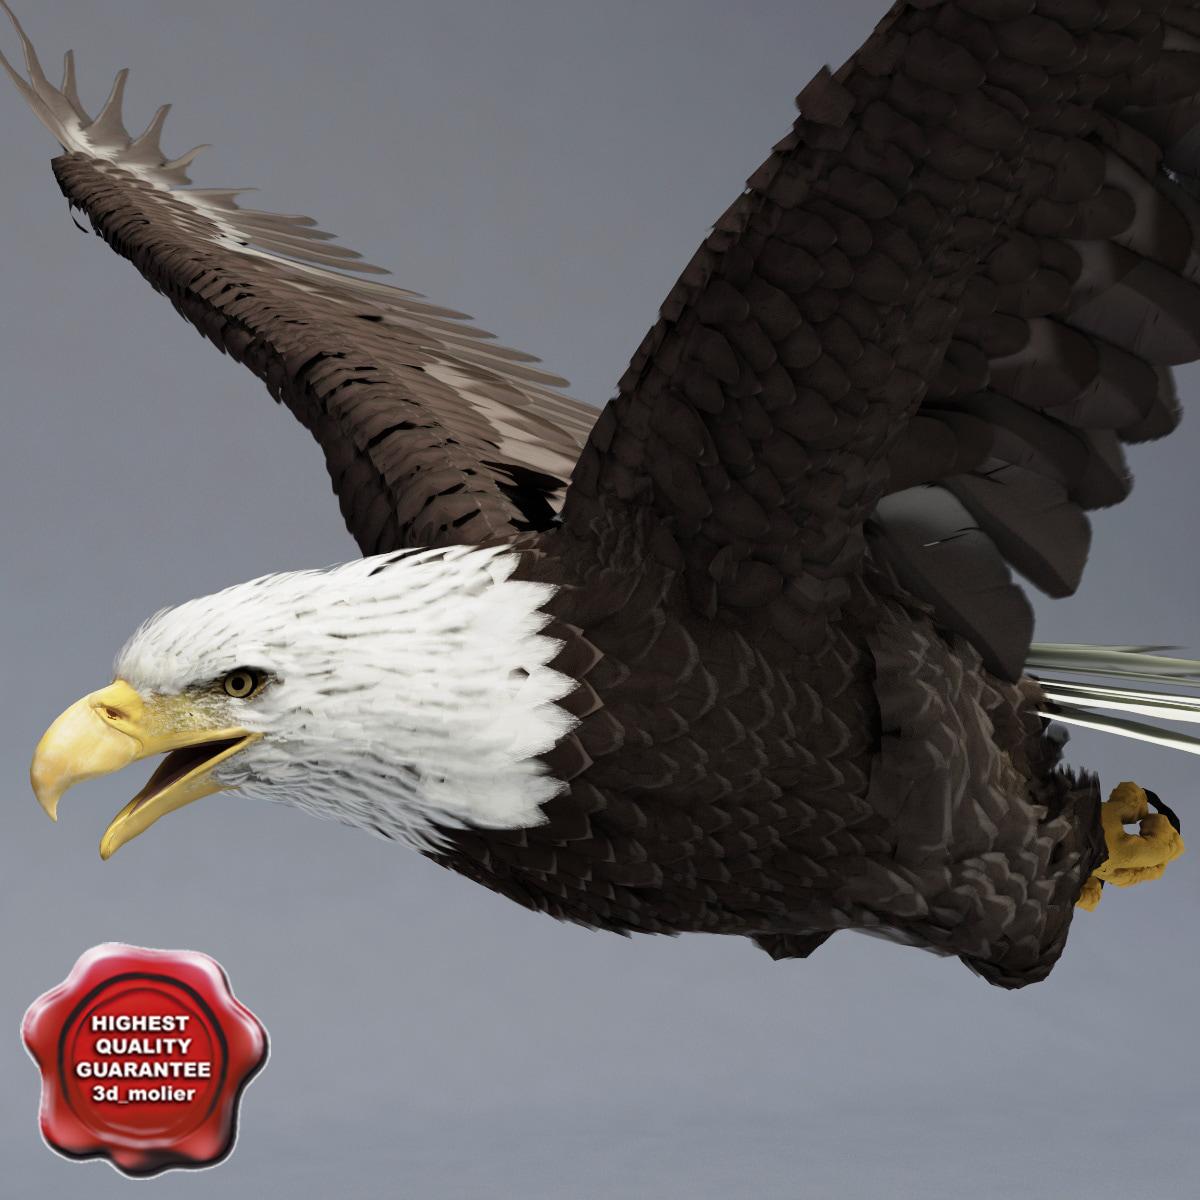 Bald_Eagle_Pose3_00.jpg